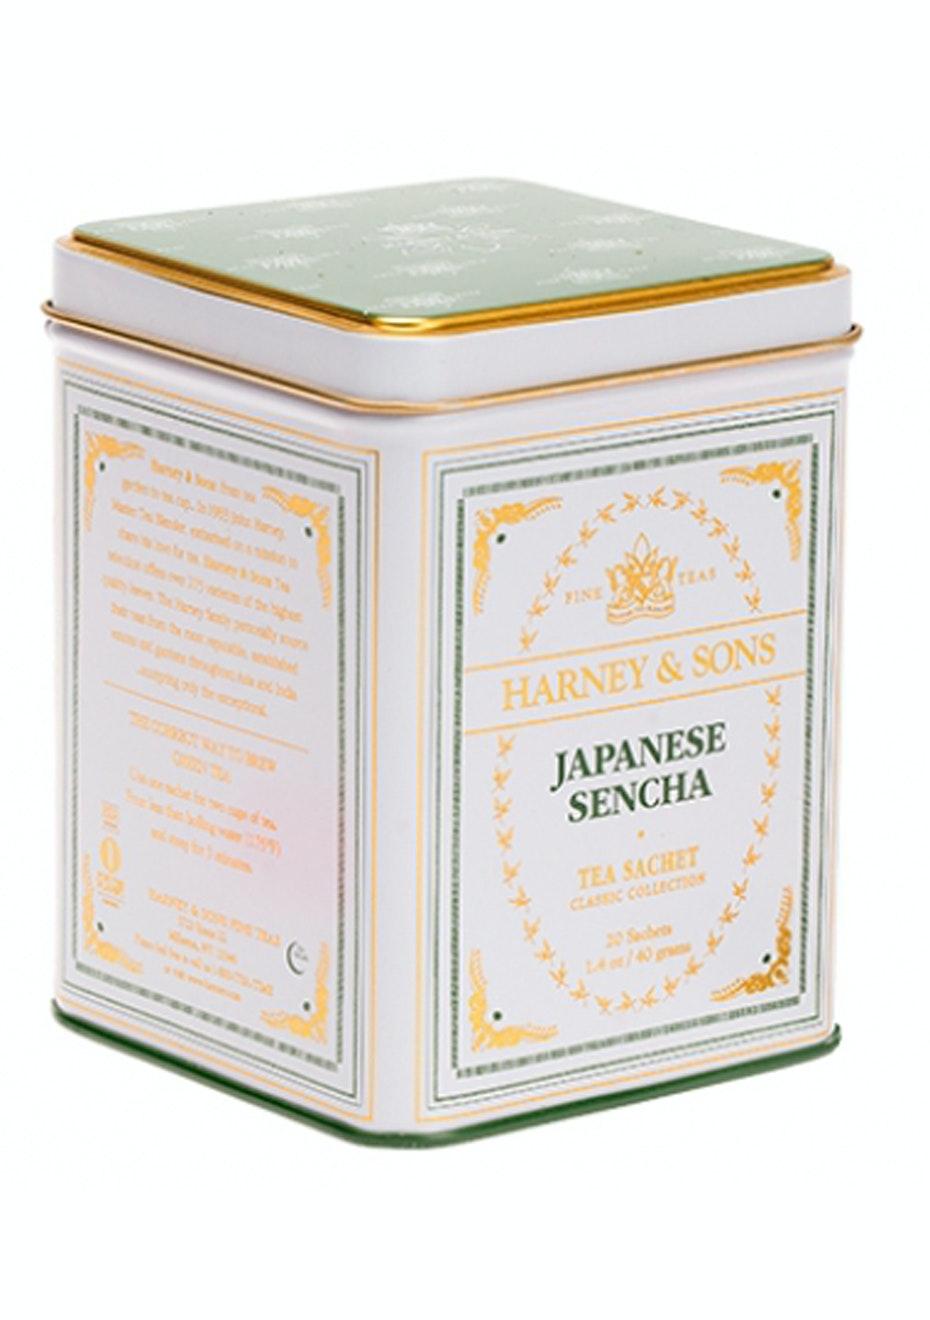 Harney & Sons - Japanese Sencha - 20 Sachet Tin